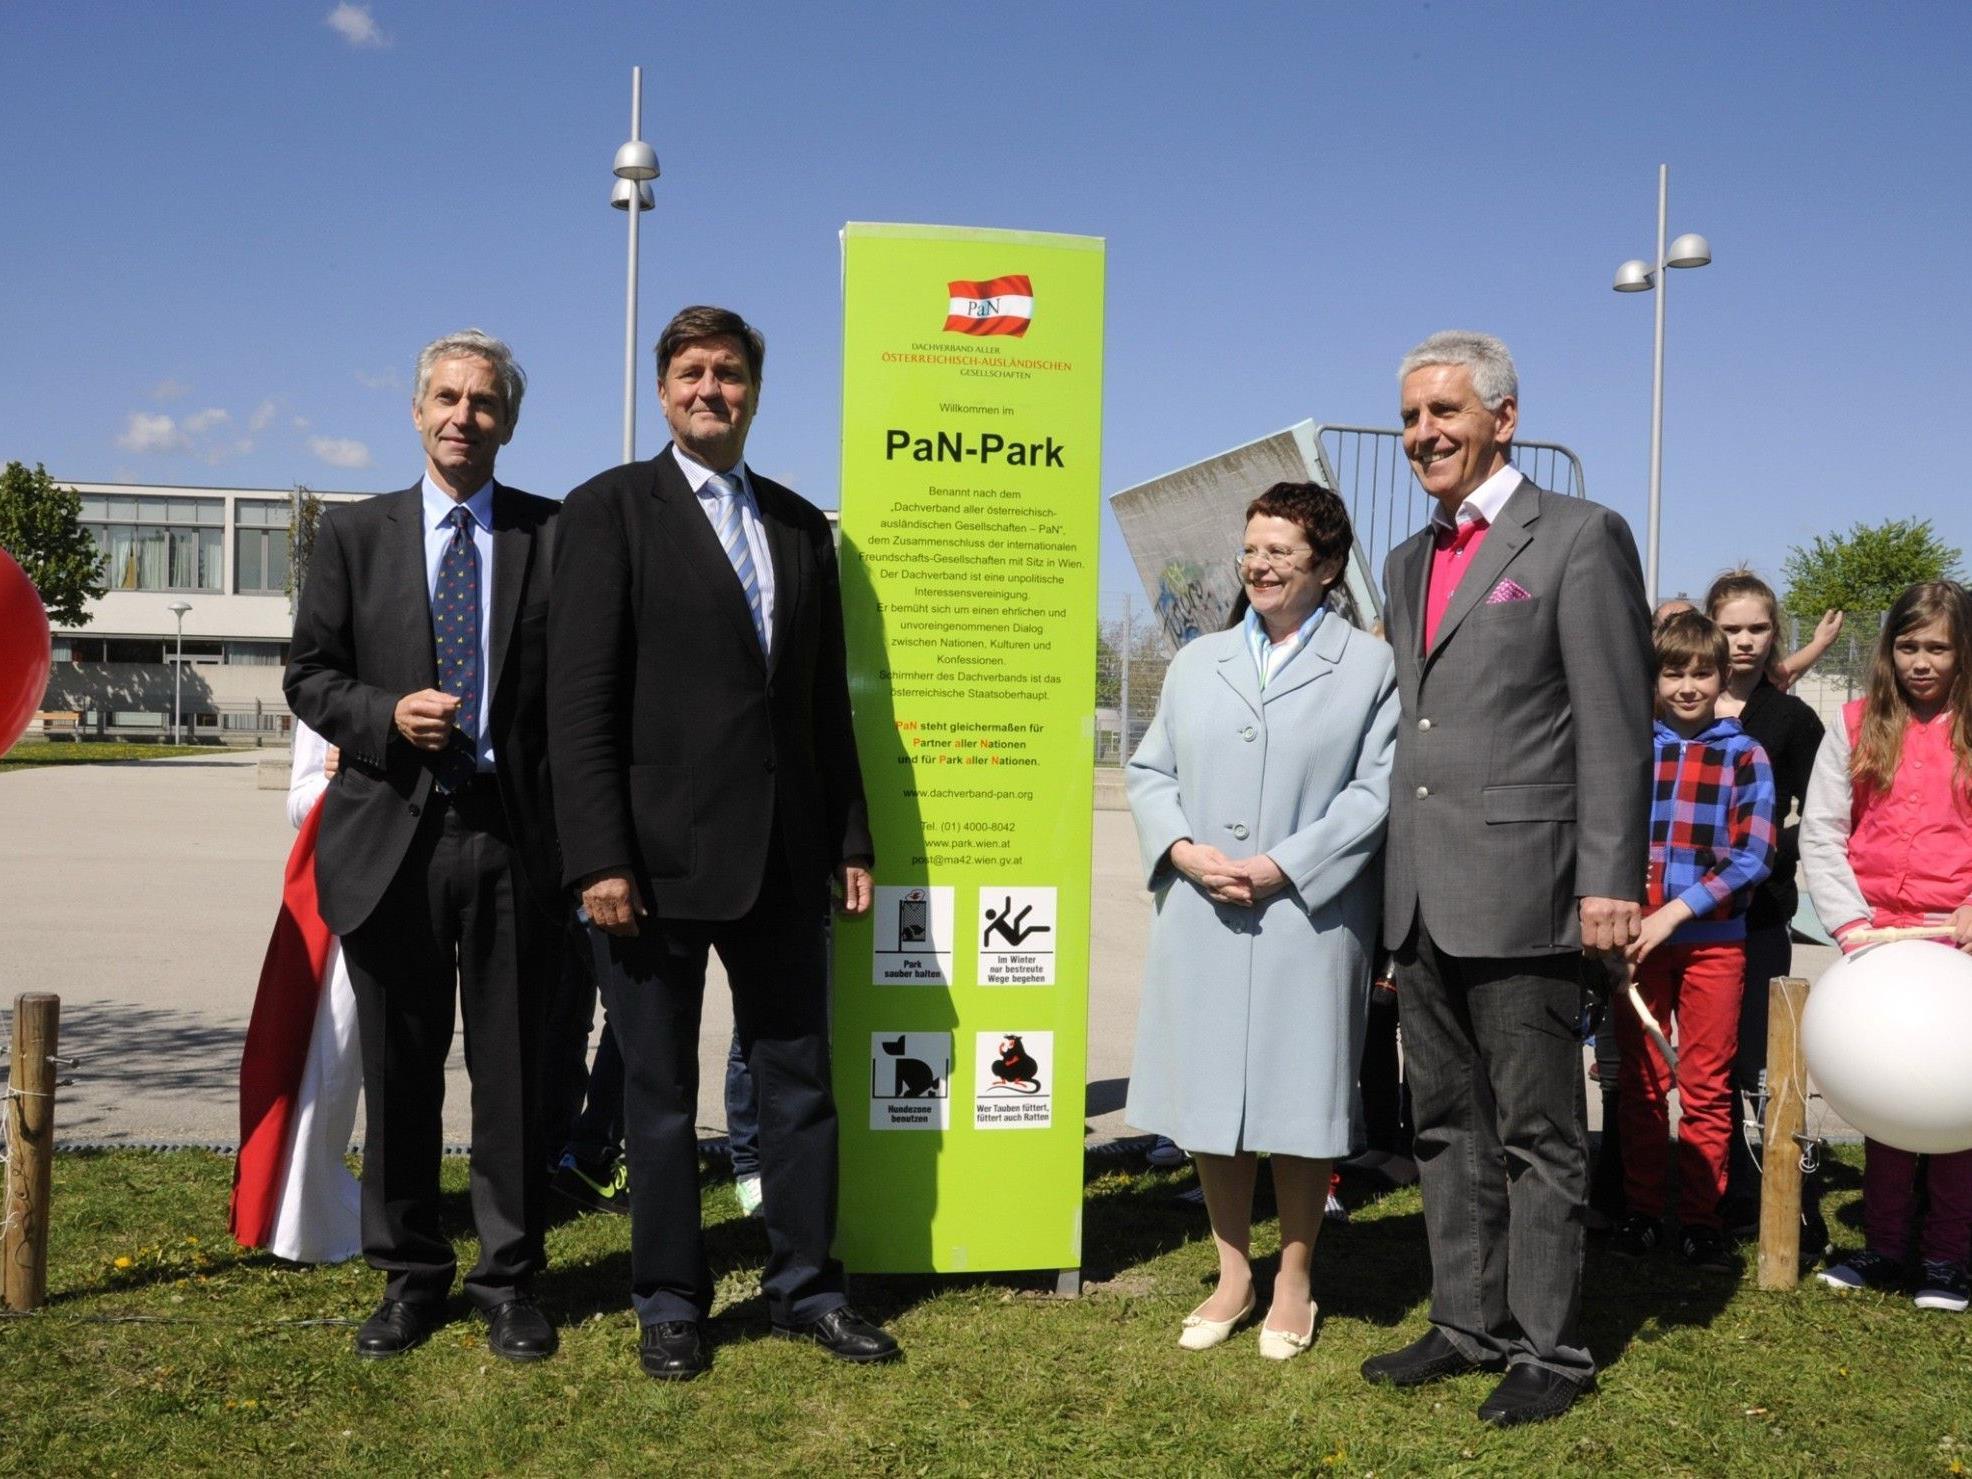 Ein Park aller Nationen in Liesing - Oskar Wawra (MD-EUI), Manfred Wurm (BV 23), Elke Atzler (BMeiA), Claus Walter (PaN)